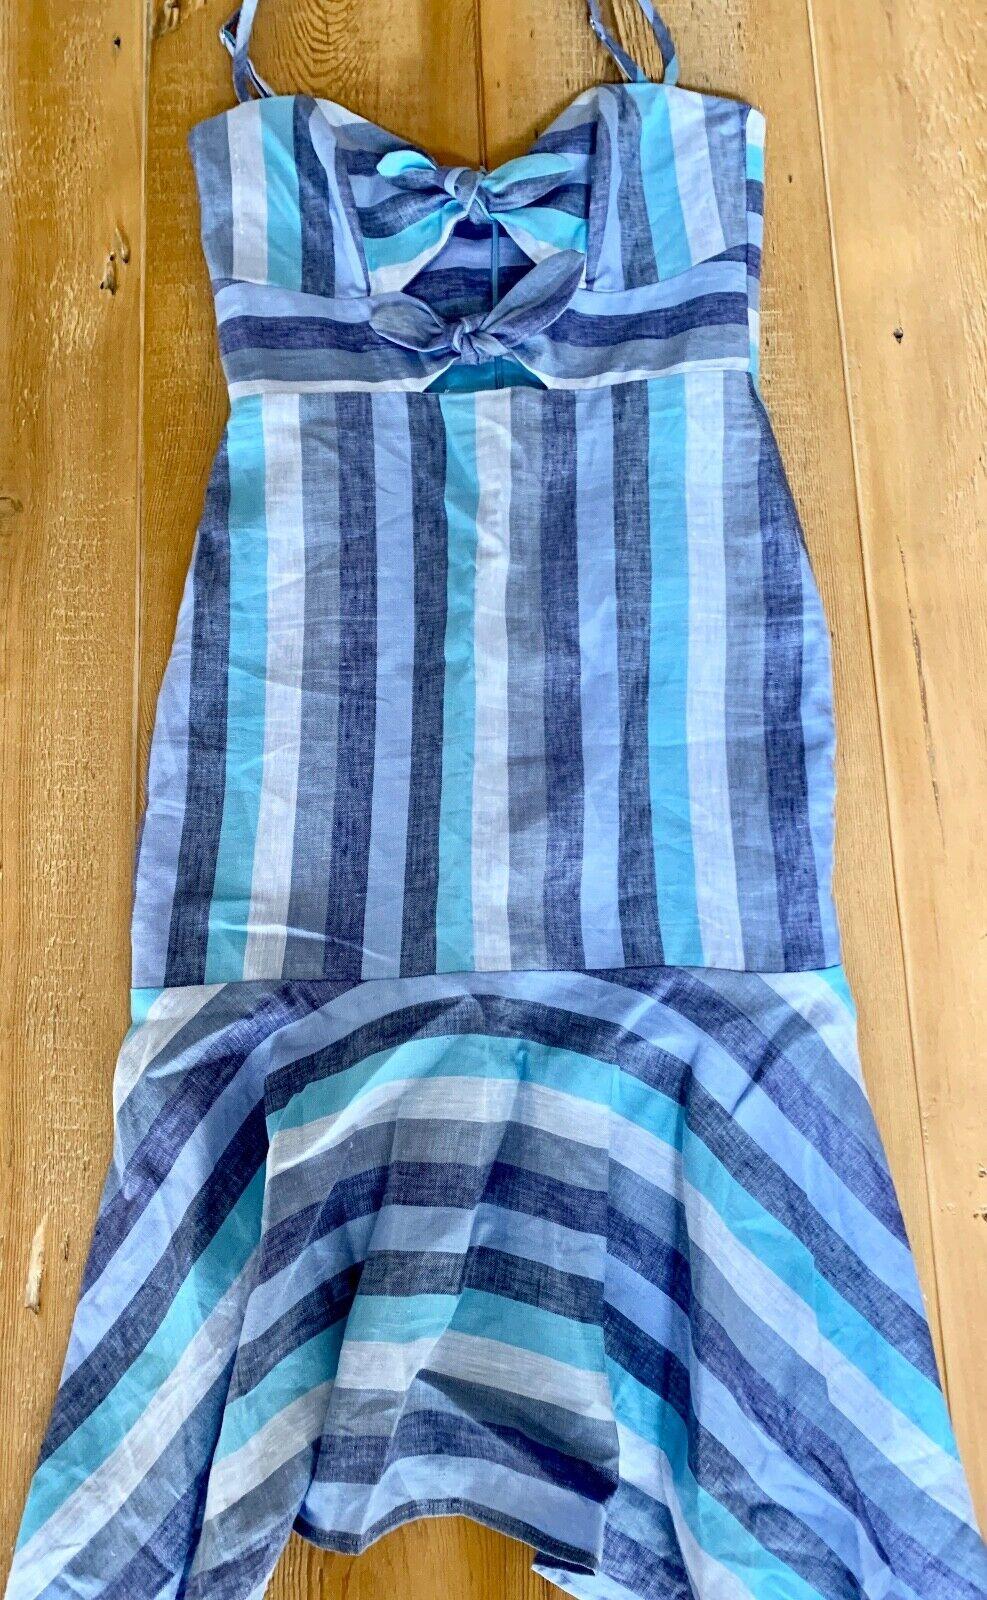 Karina Grimaldi Nelia Blau Stripe Dress, NWT, Größe S (2-4)